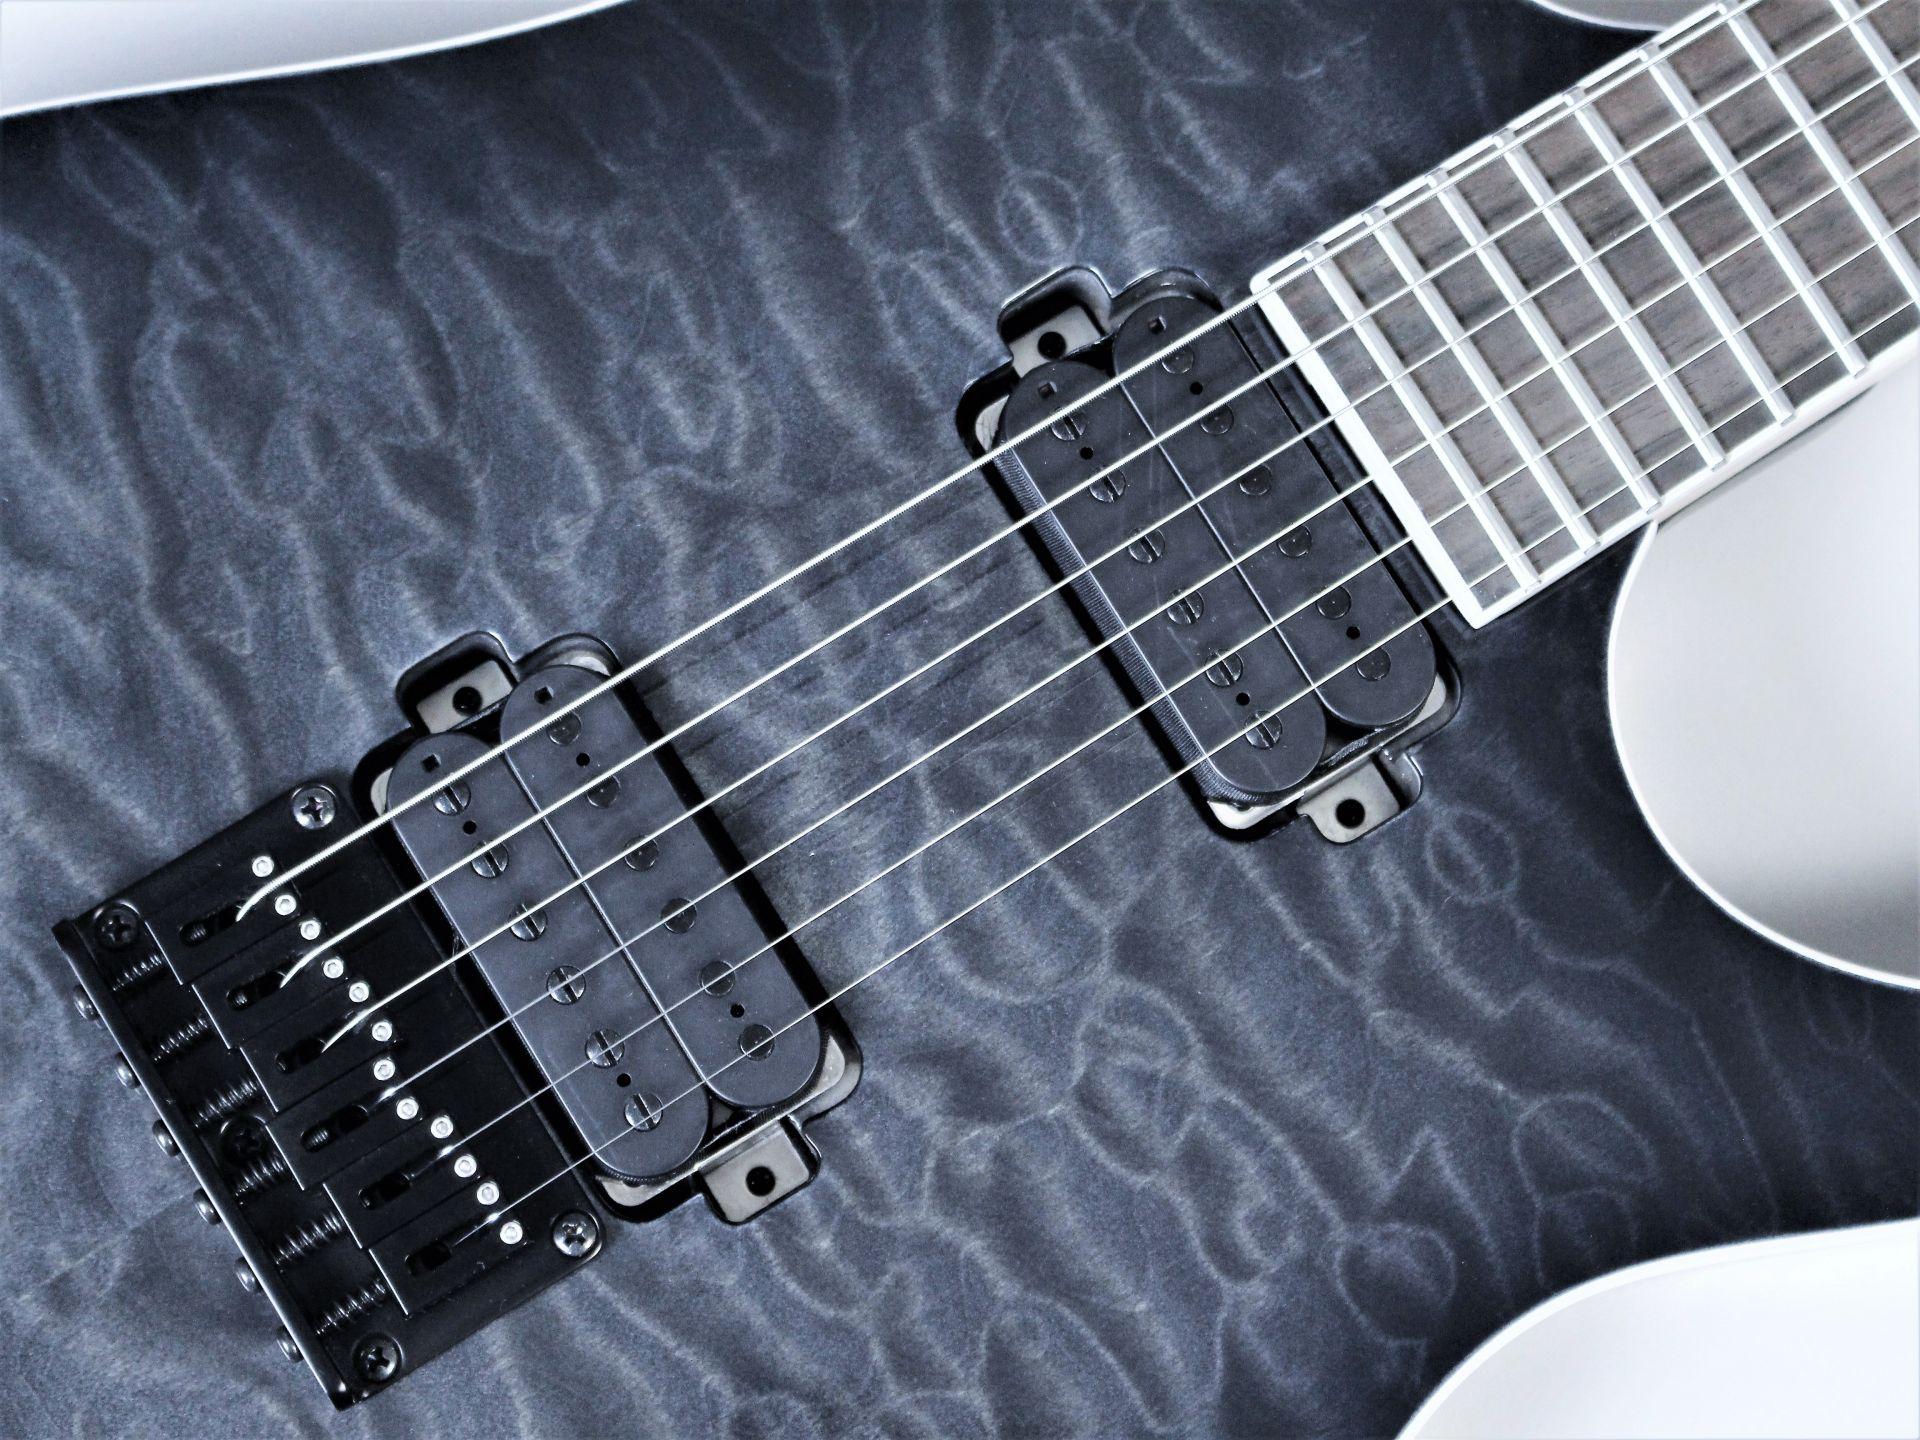 Strictly 7 Guitars – Cobra JS6 QM BBG【6本限定モデル】【4月28日発売・予約受付中】の全体画像(縦)